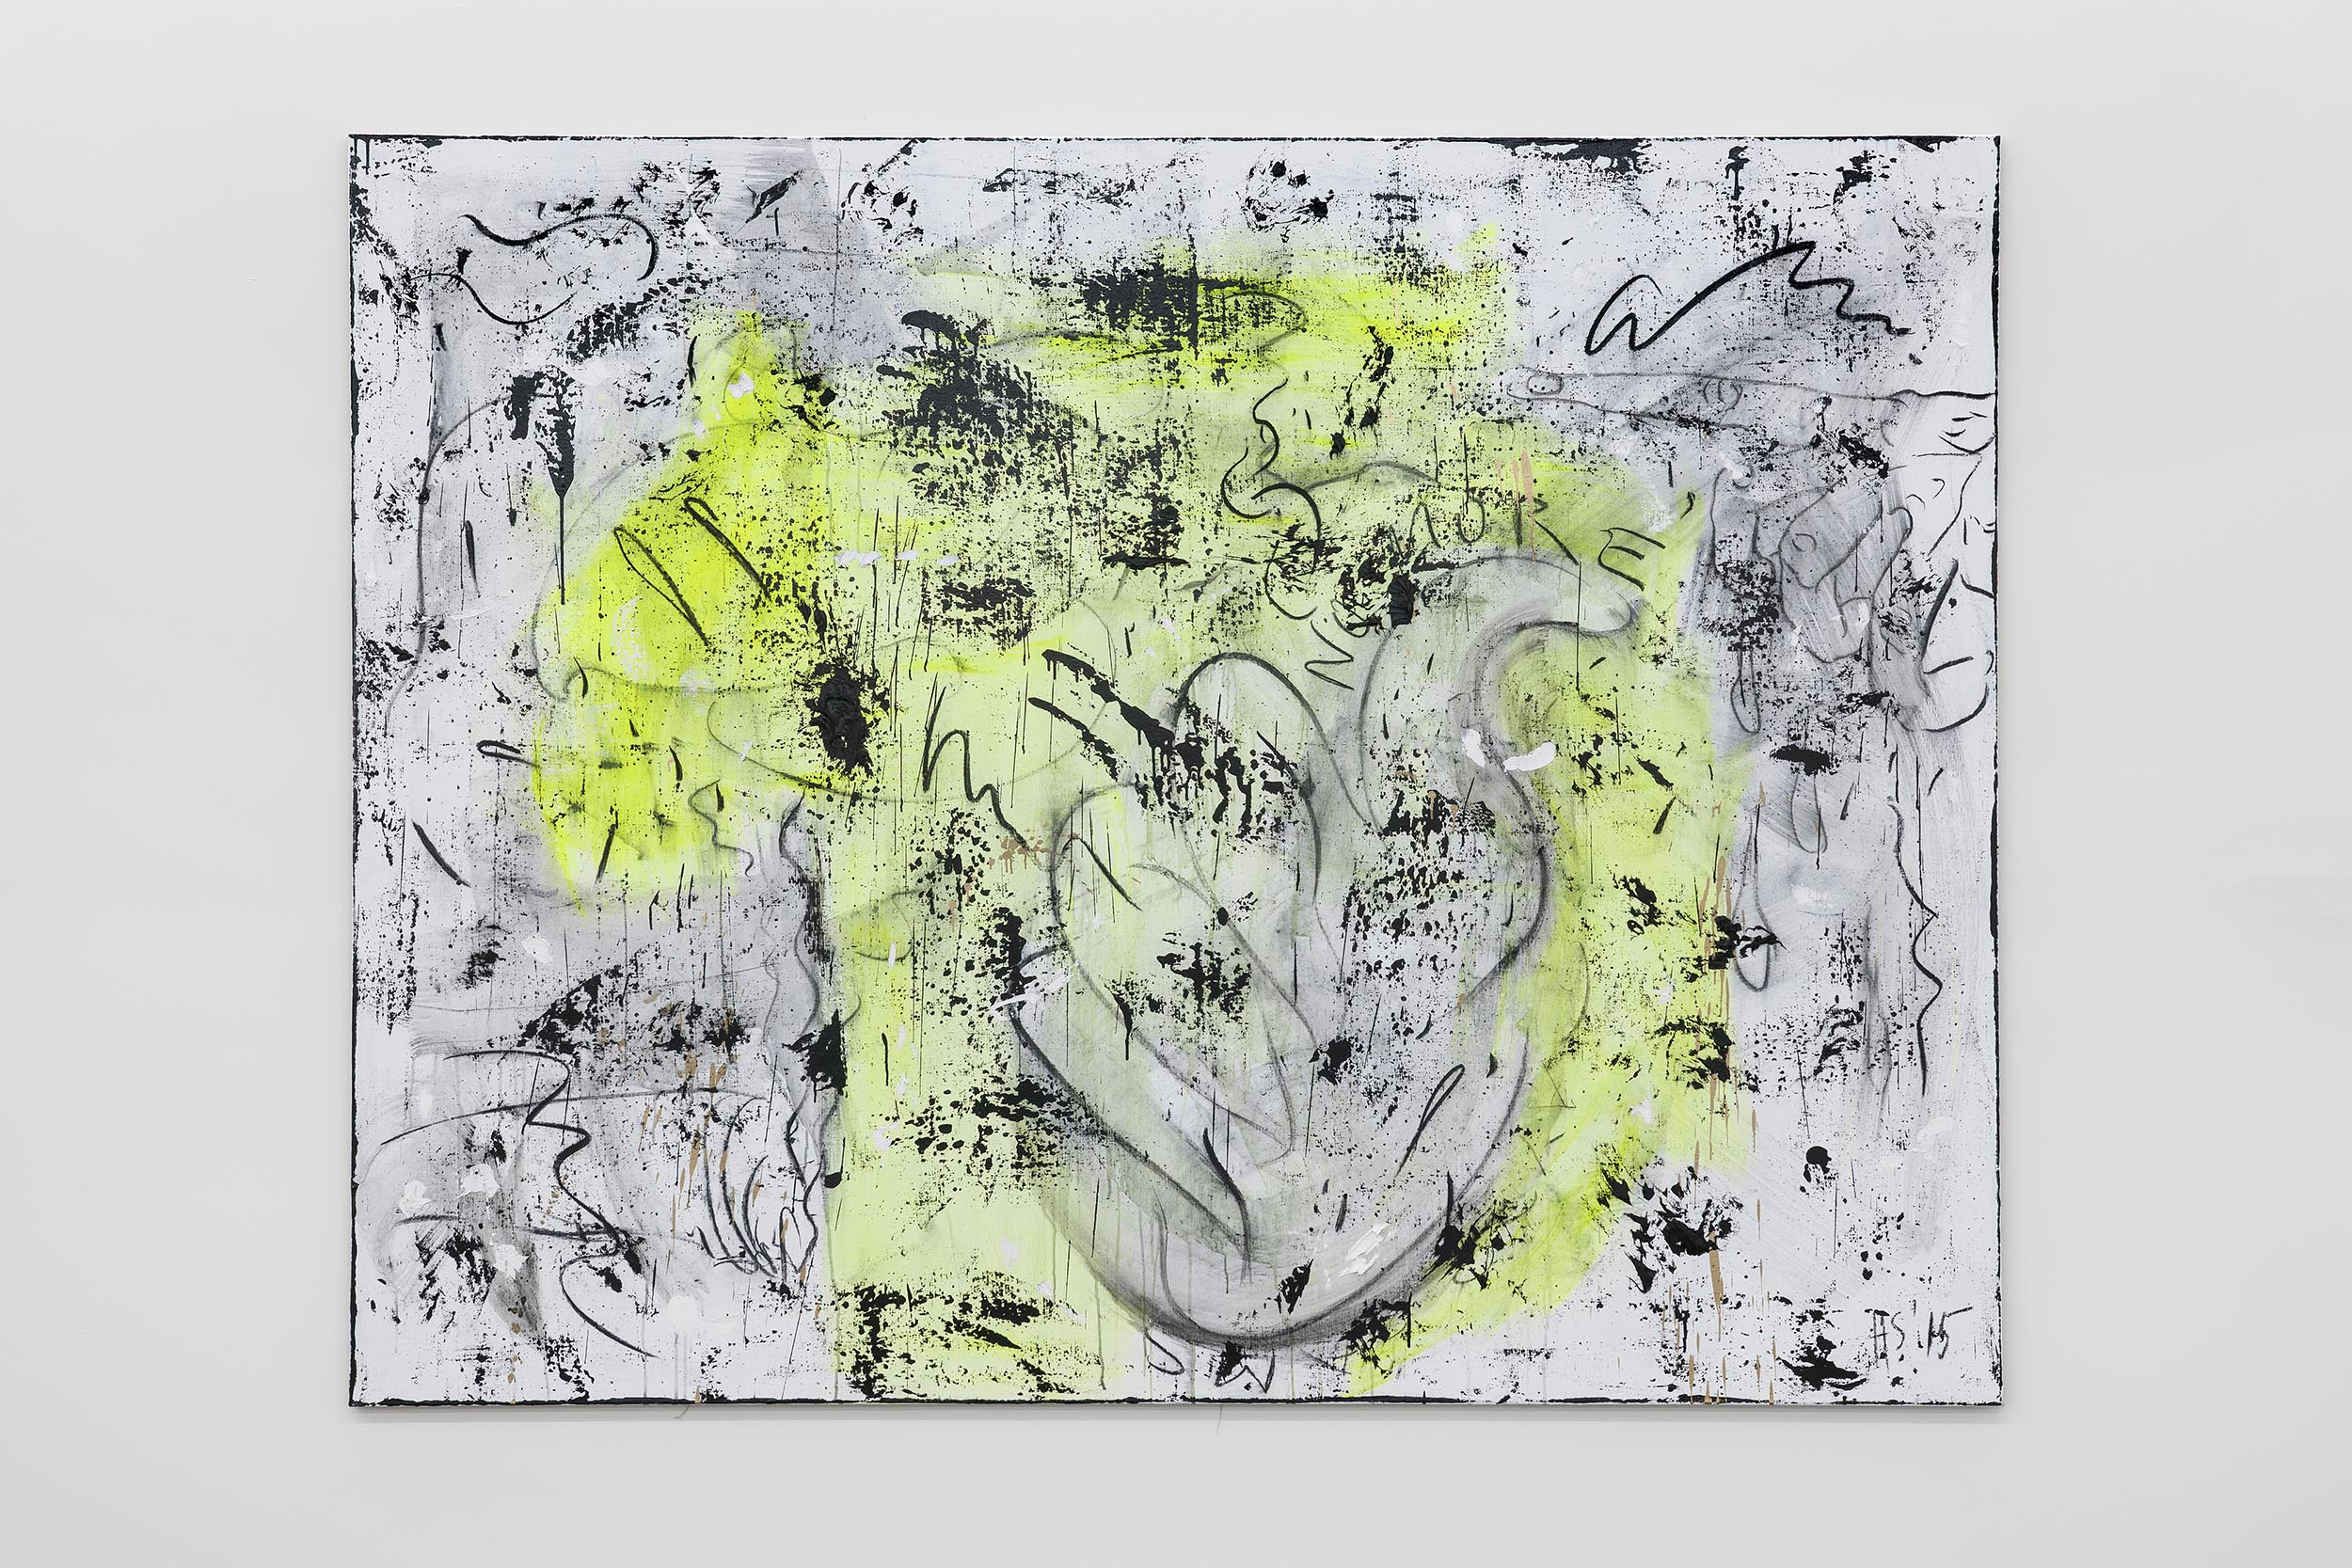 2 - Henning Strassburger at Kunstverein Reutlingen